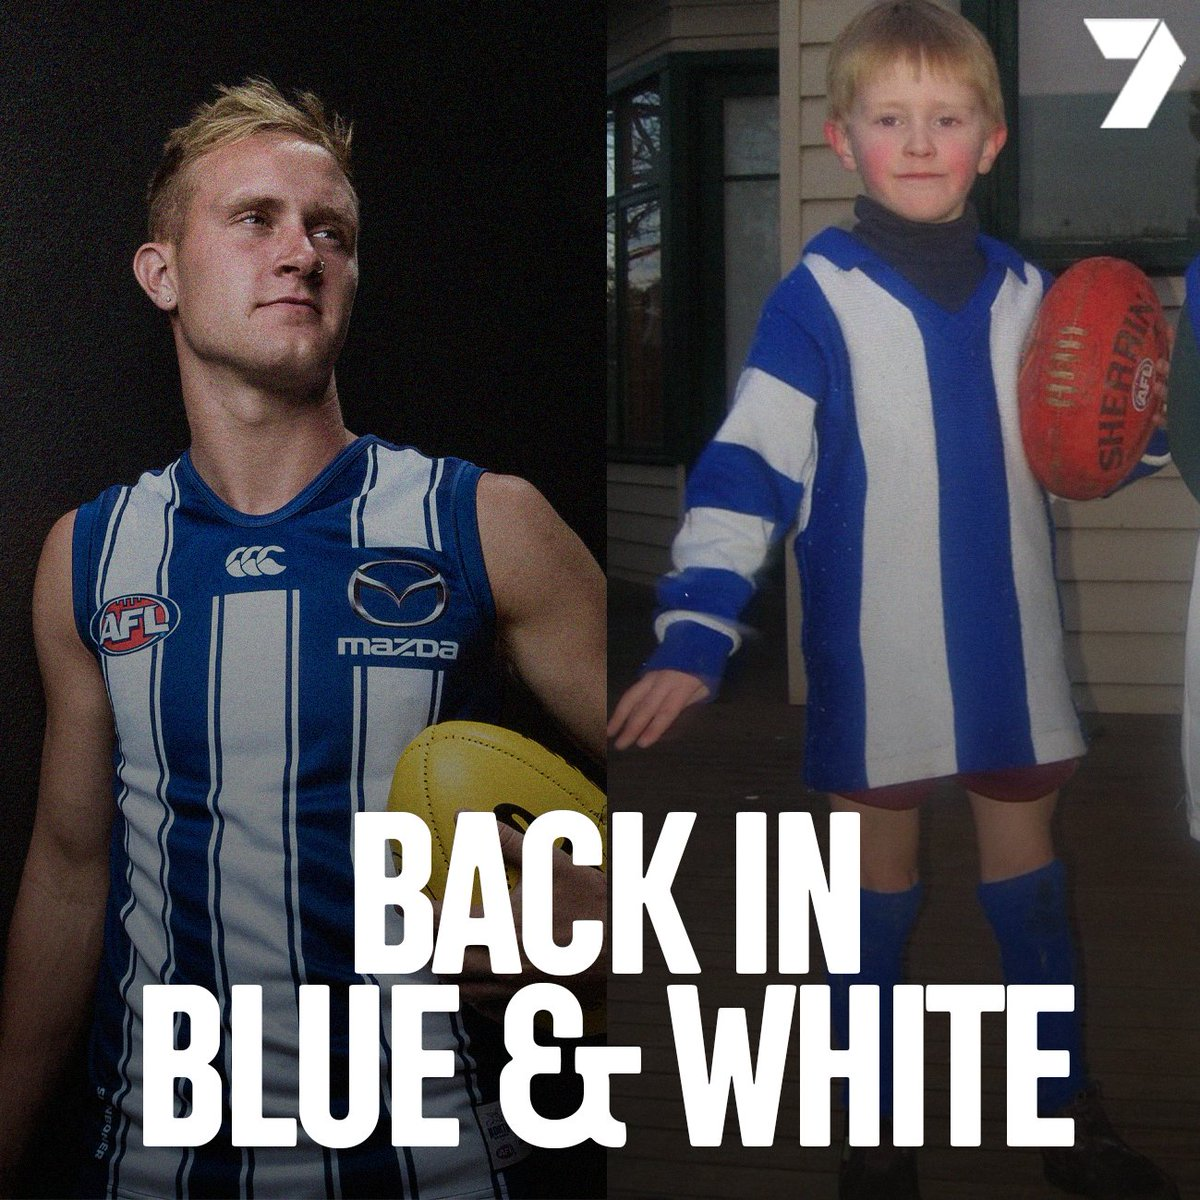 Not the first time Jaidyn Stephenson has worn blue and white 🔵⚪️🦘️  Via @SamLandsberger https://t.co/zcqn3jk6af